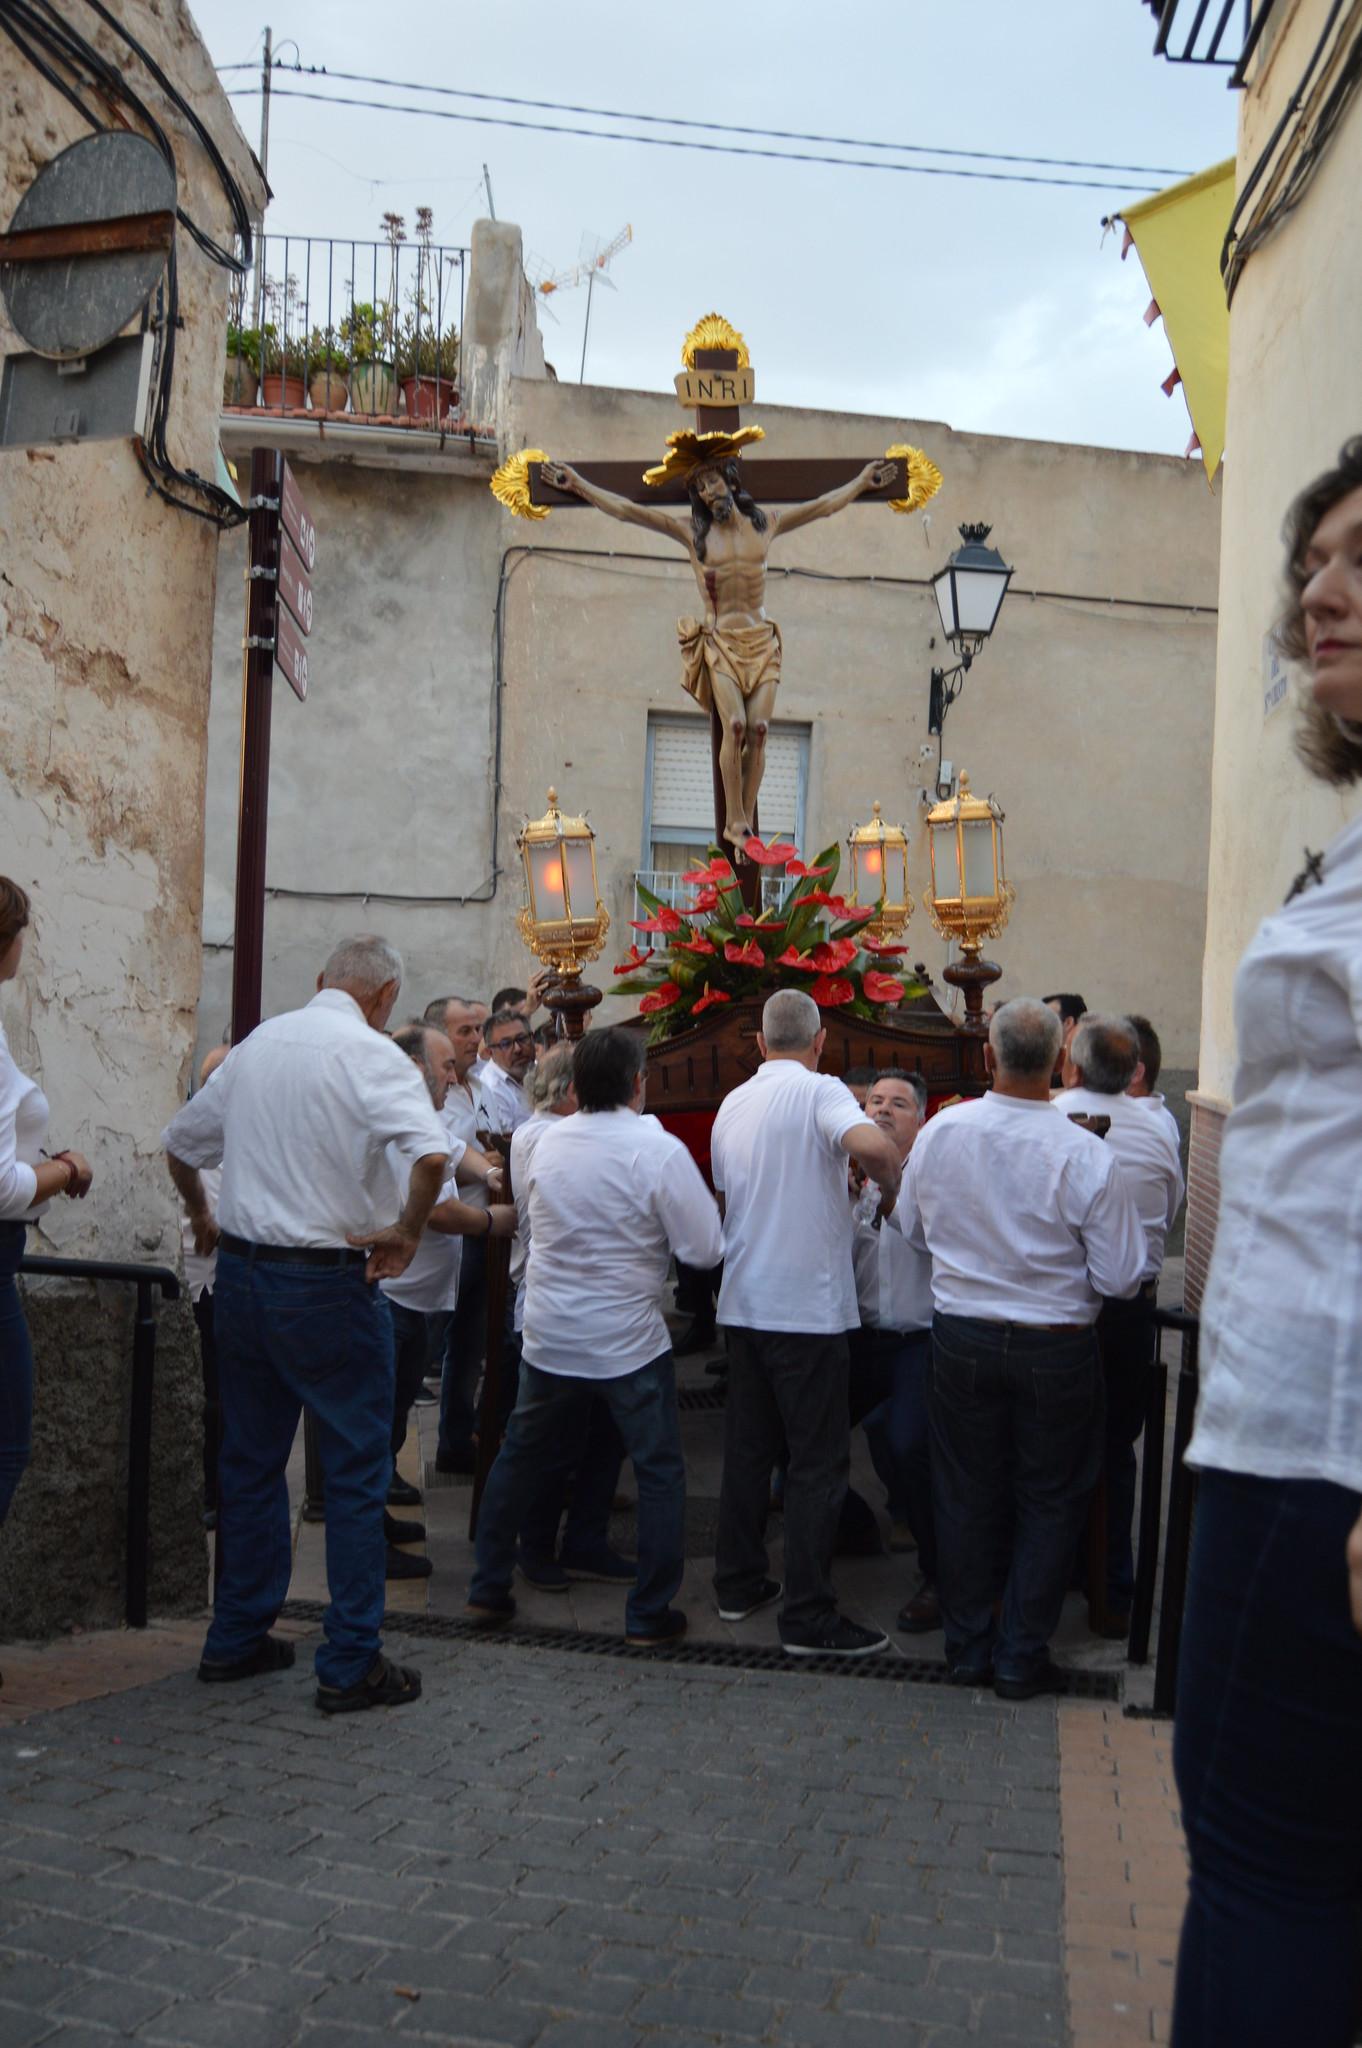 (2019-07-07) Procesión de subida - Adrián Romero Montesinos (15)